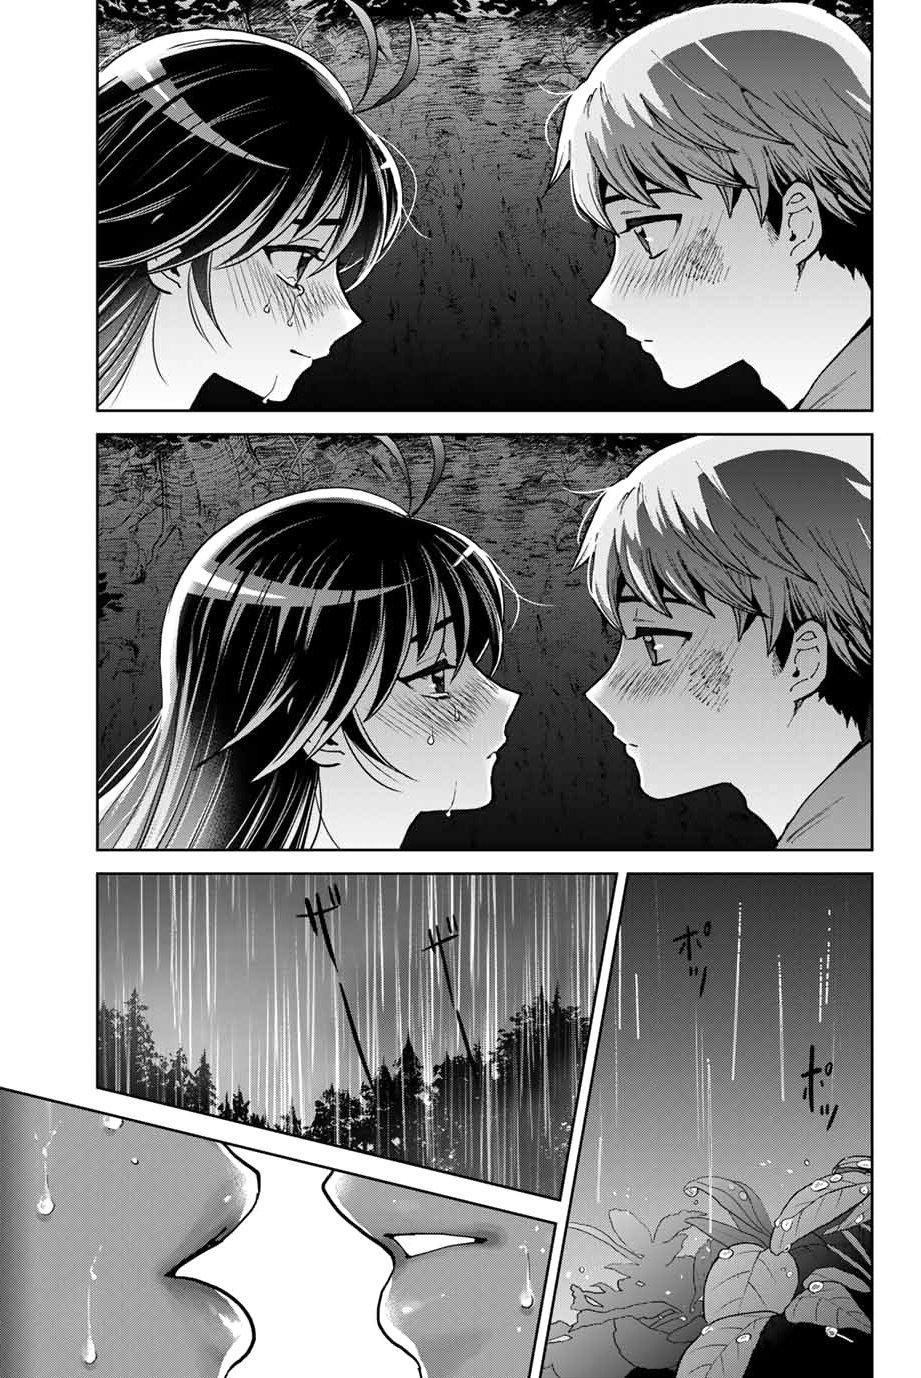 Bokutachi wa Hanshoku wo Yameta: Chapter 5